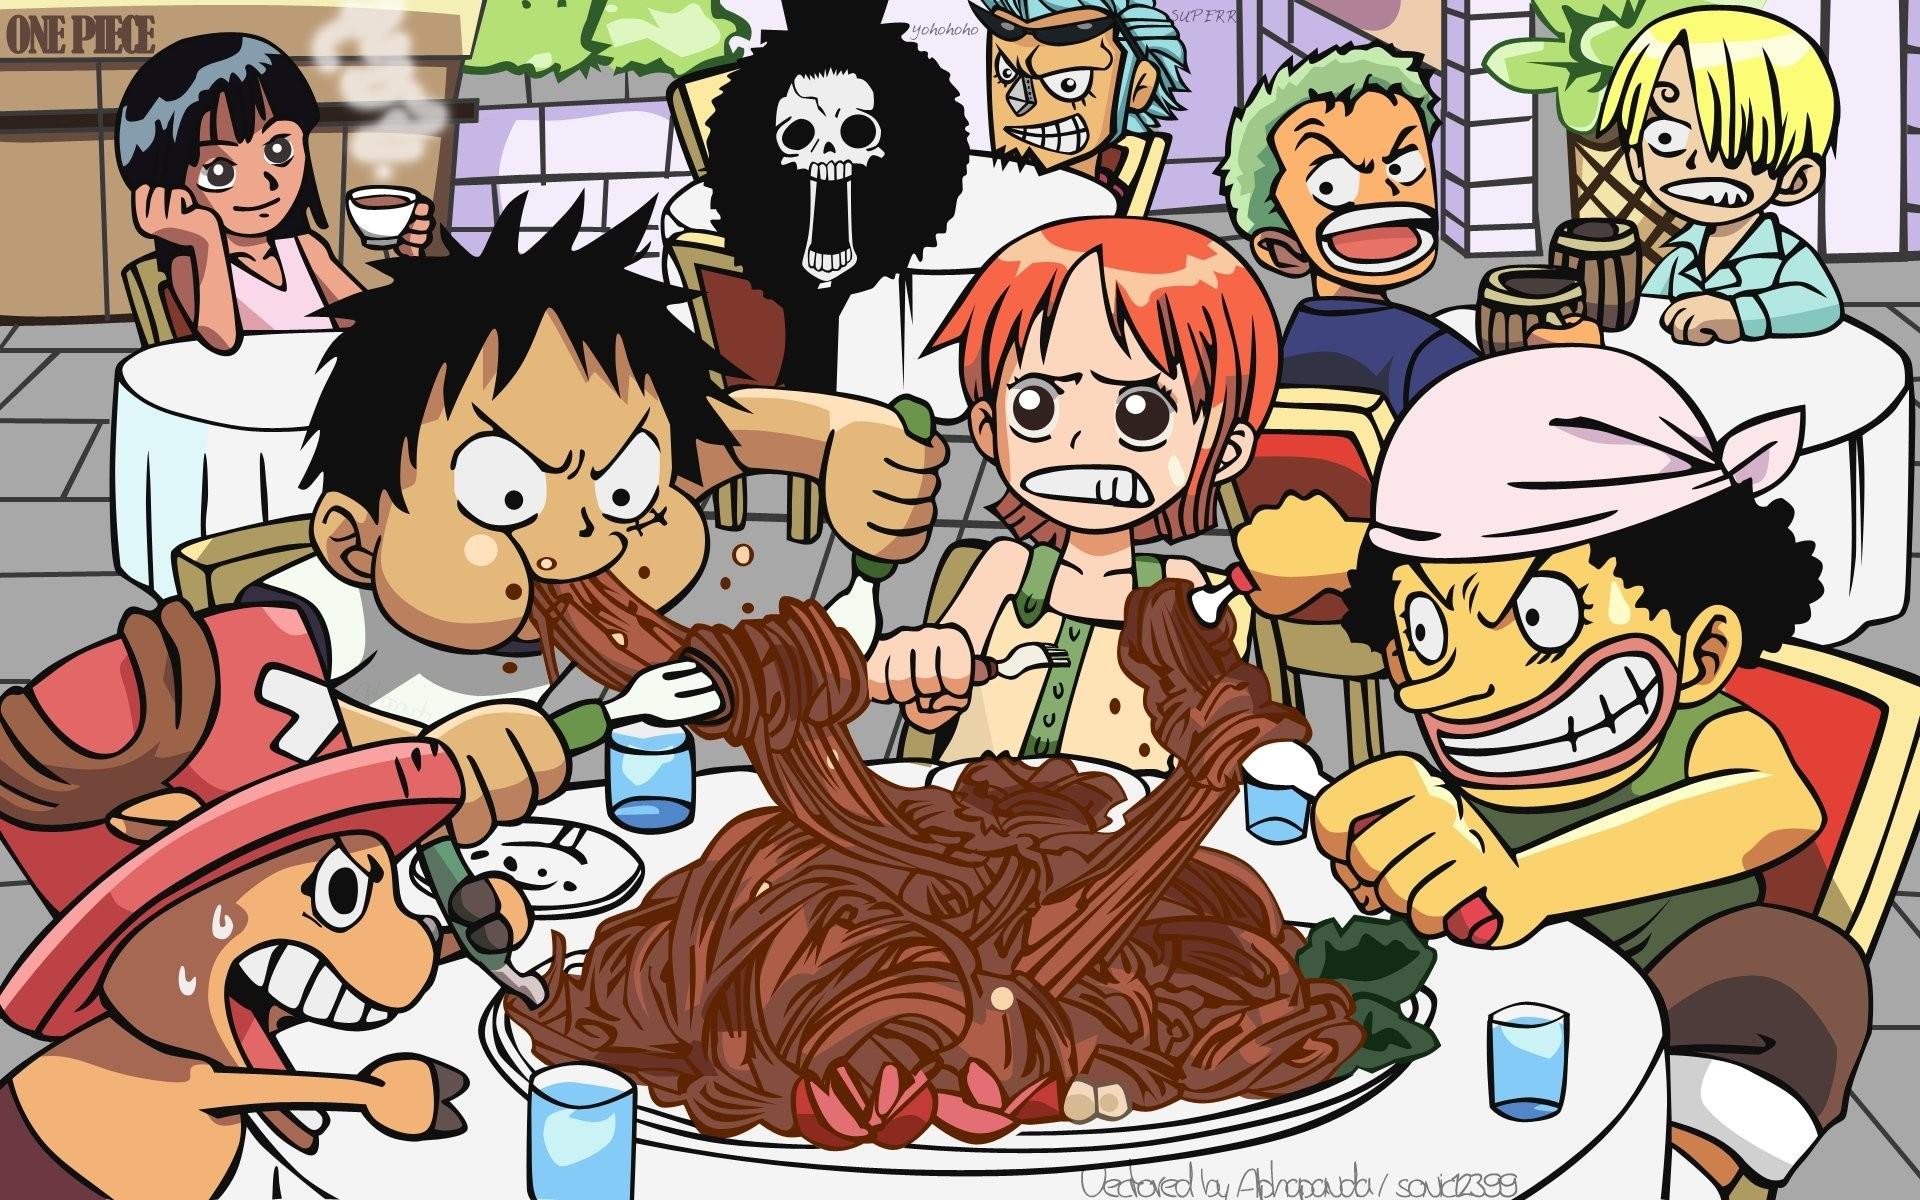 Anime One Piece